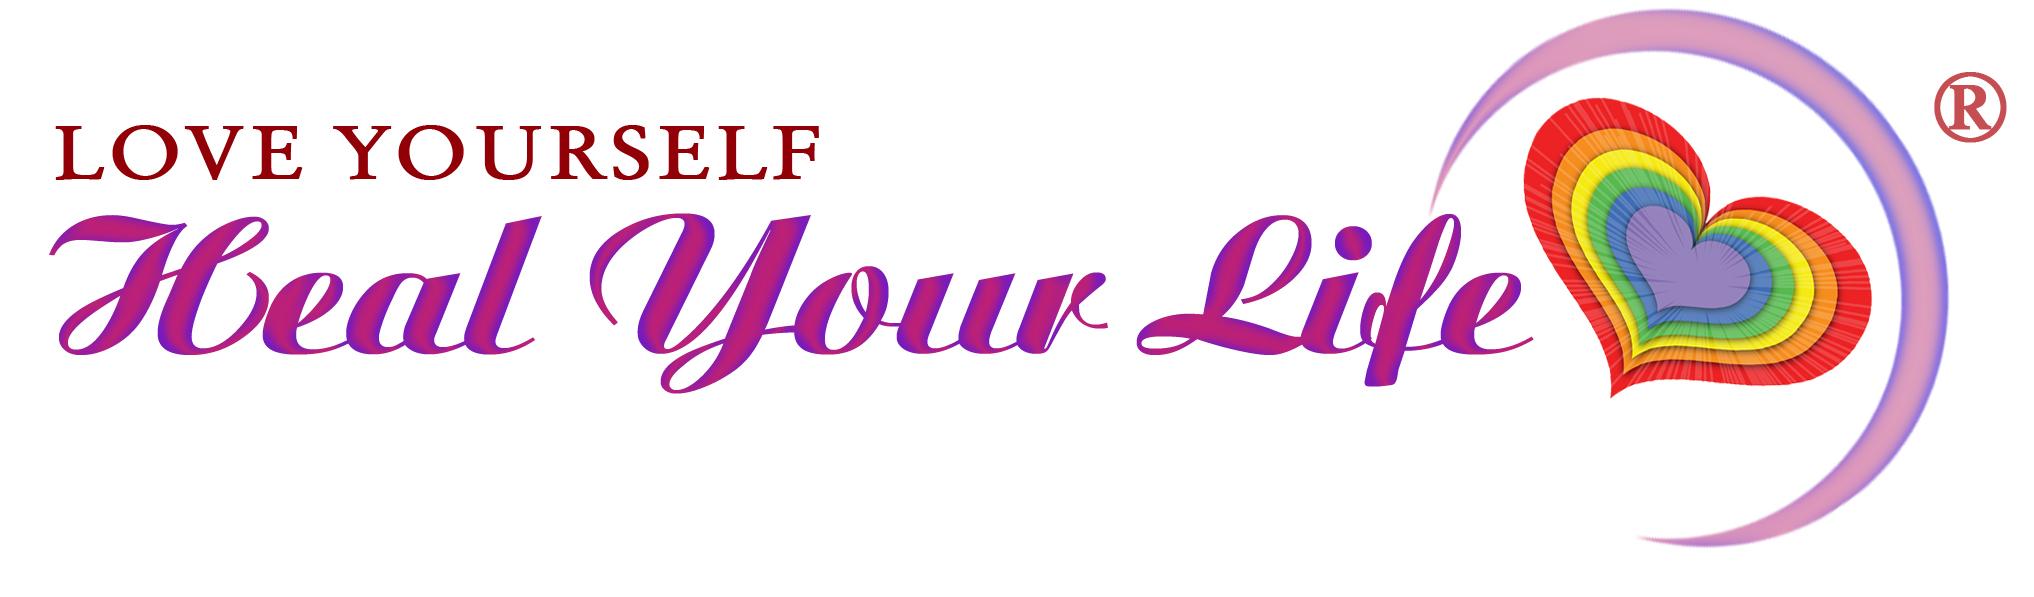 Love-Yourself-HYL-r.jpg